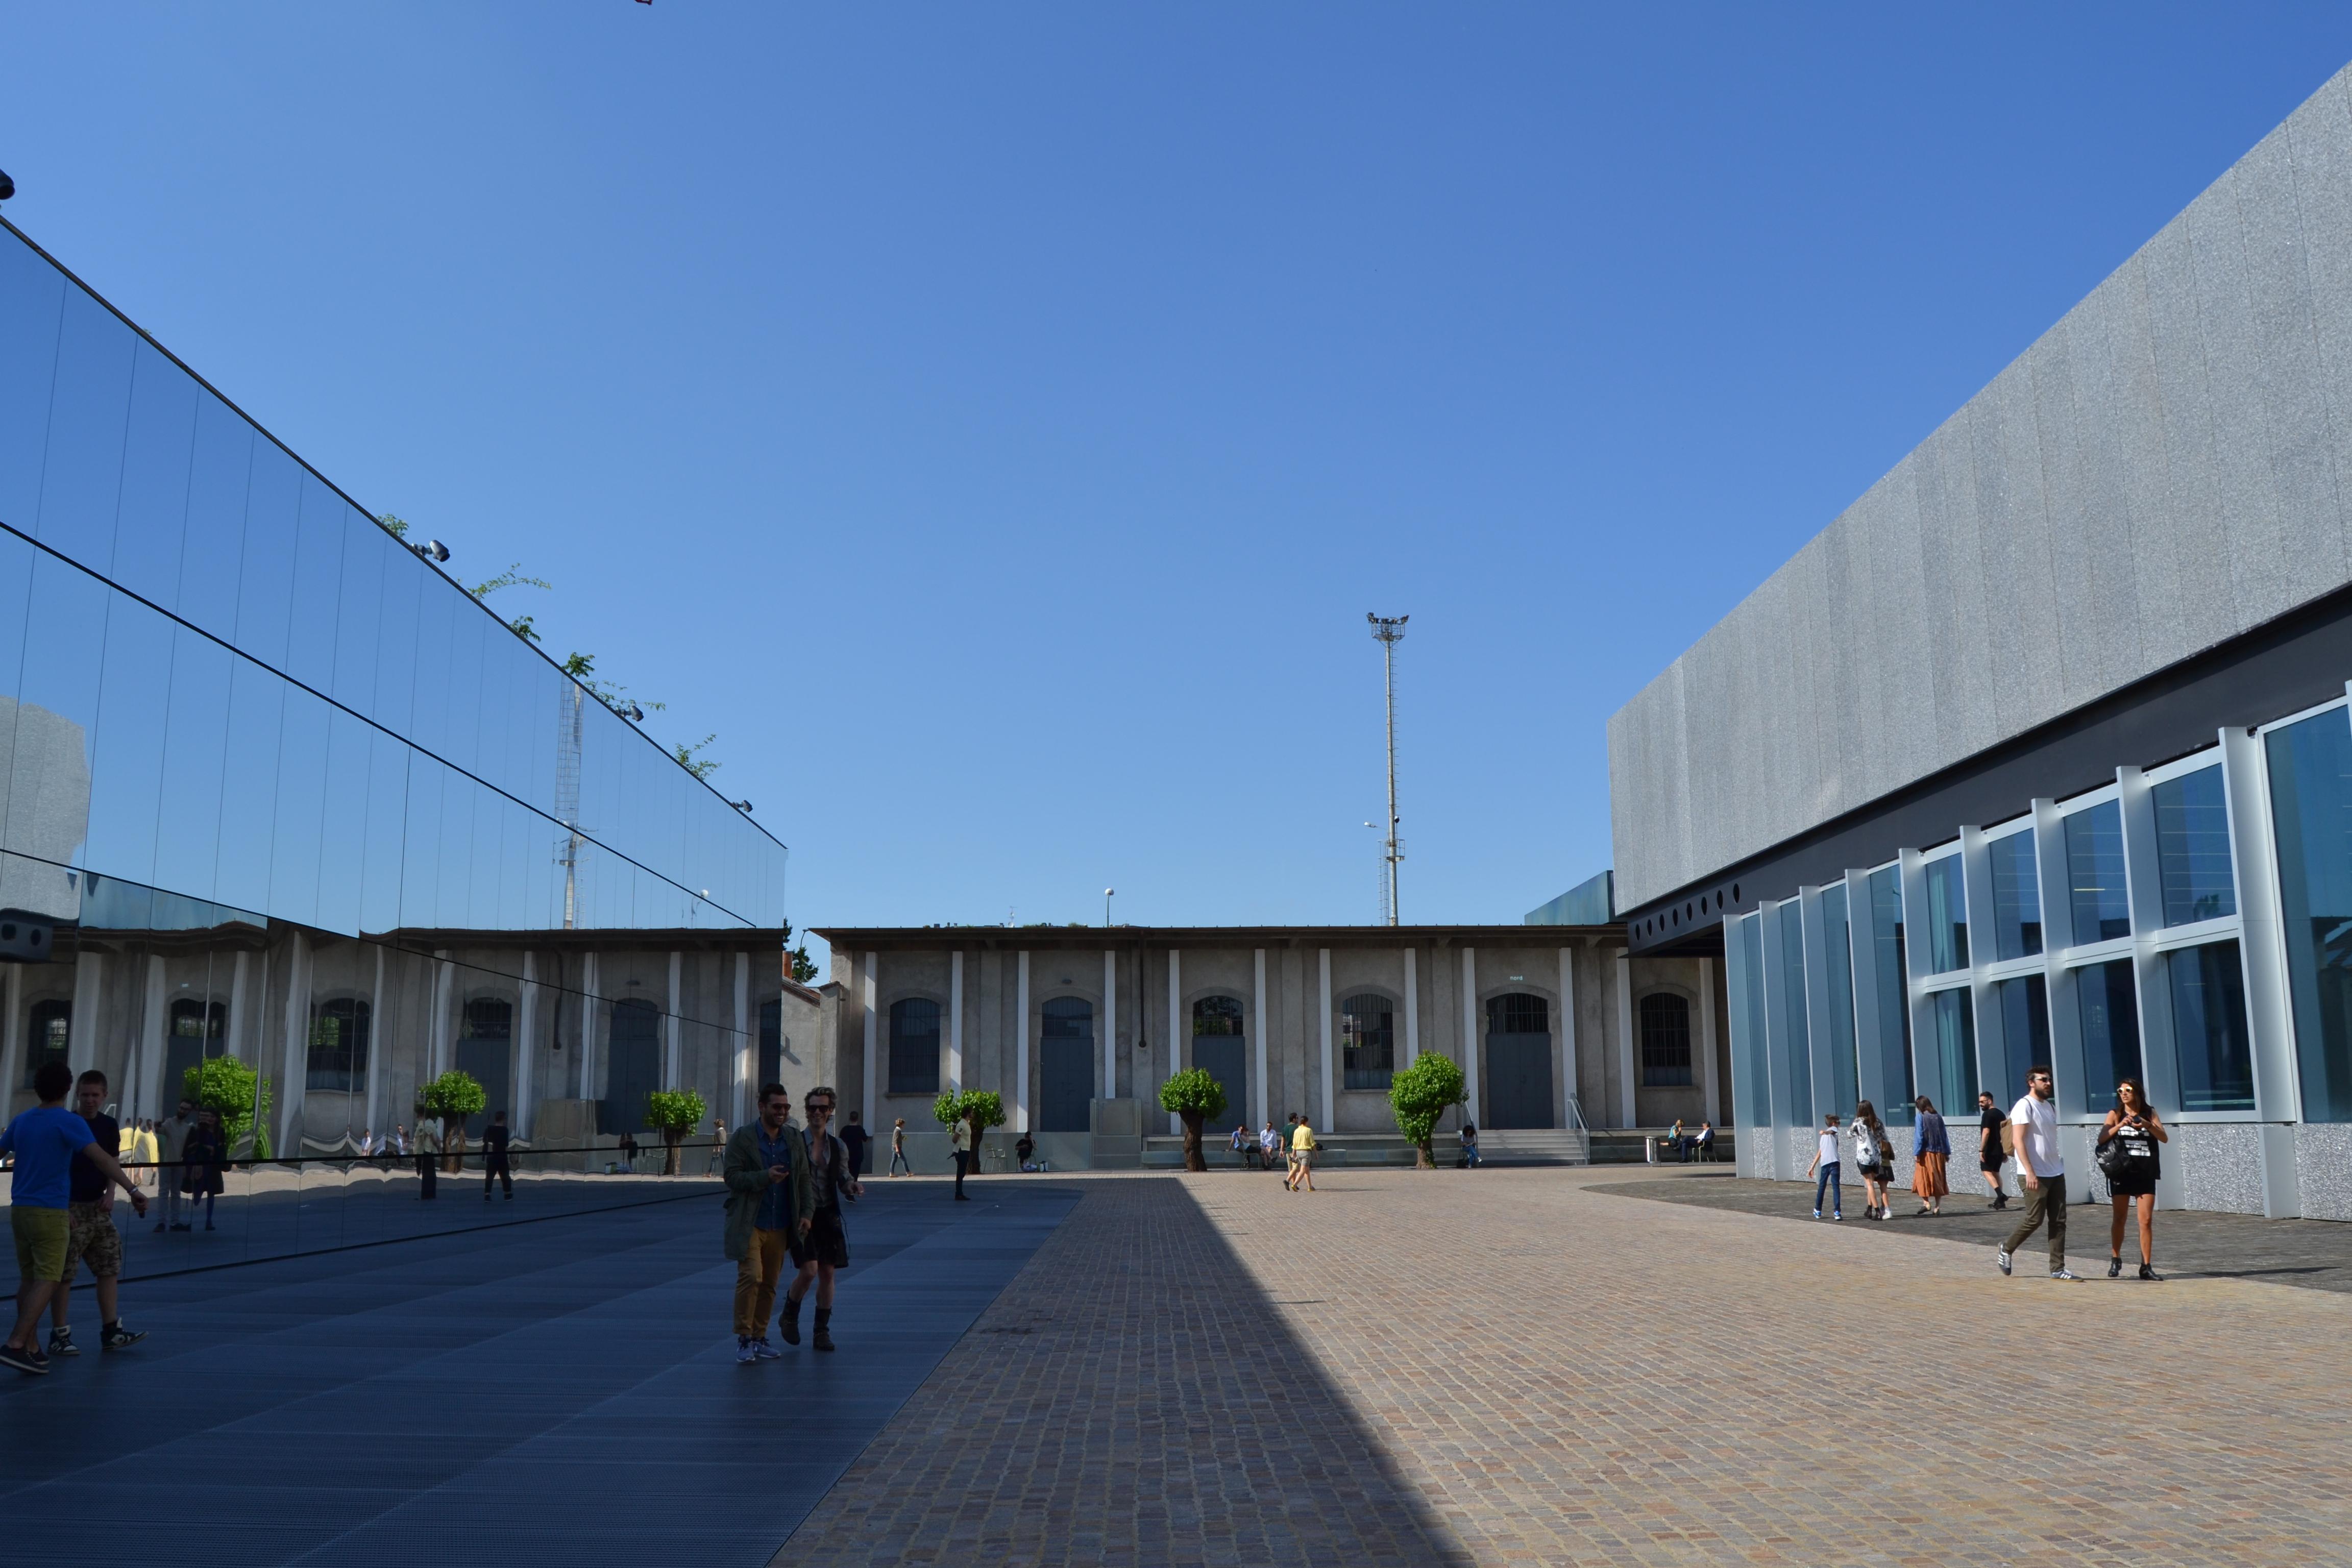 Fondazione Prada- Cinema & Cisterna.